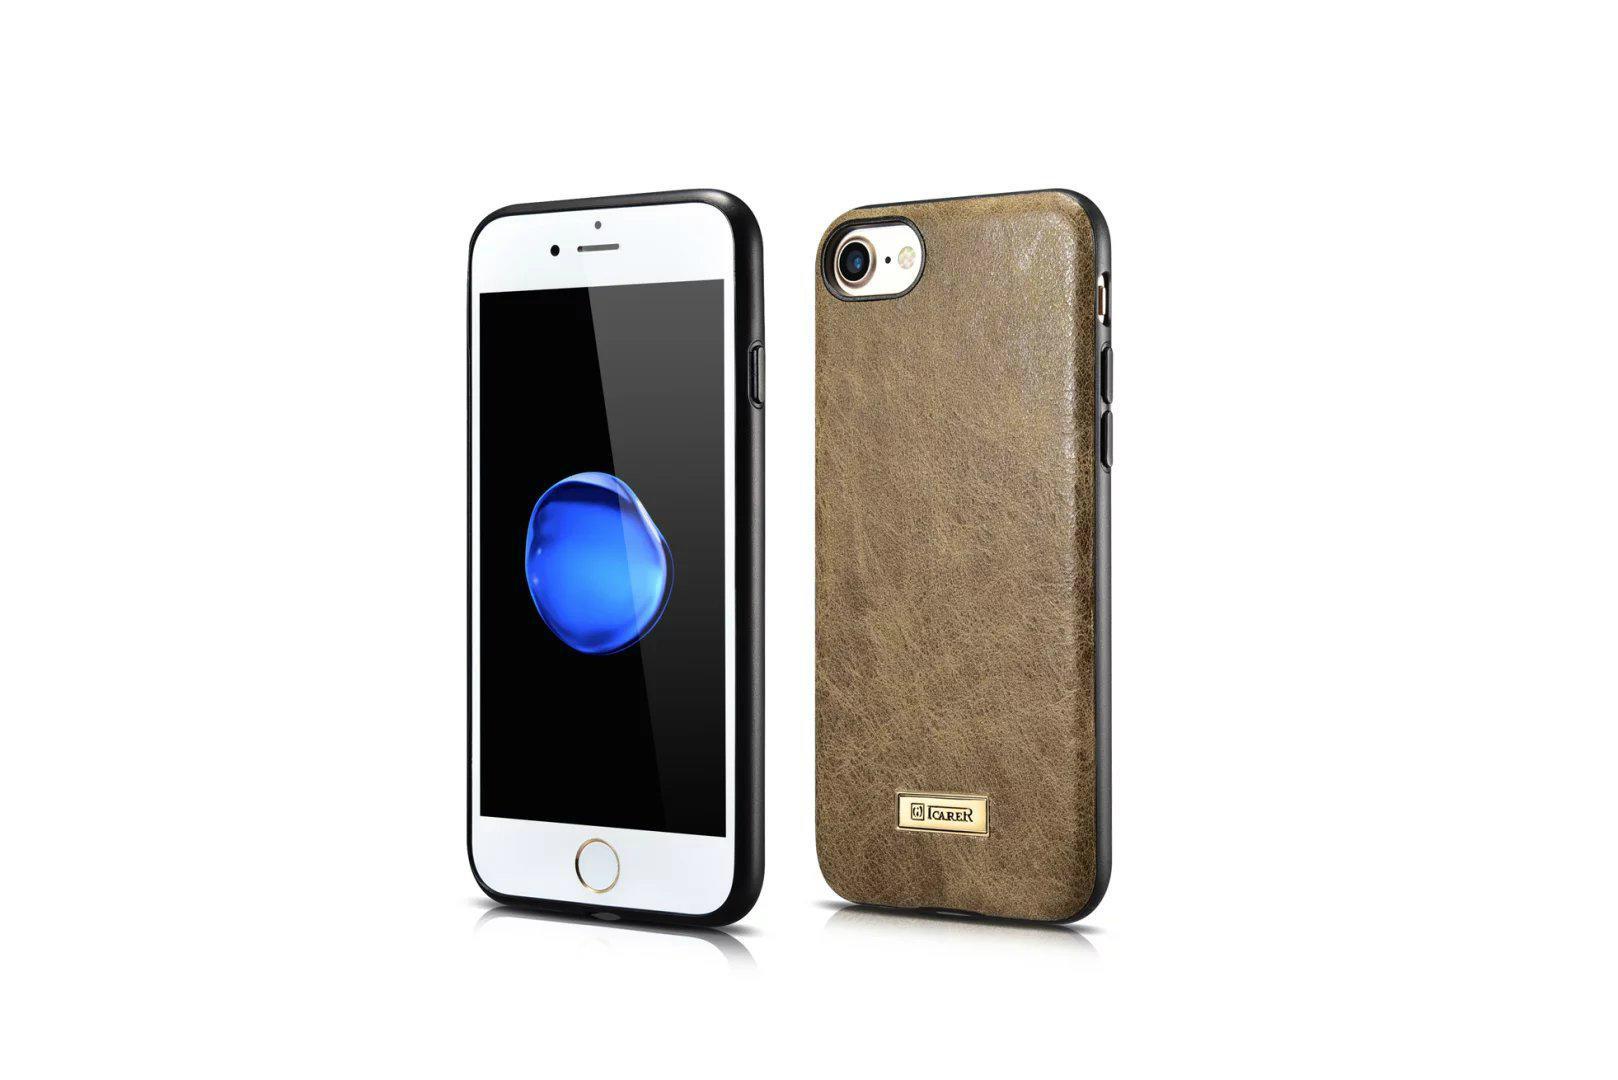 iCarer iPhone 7 Shenzhou Genuine Leather Fashional Back Cover Case 4